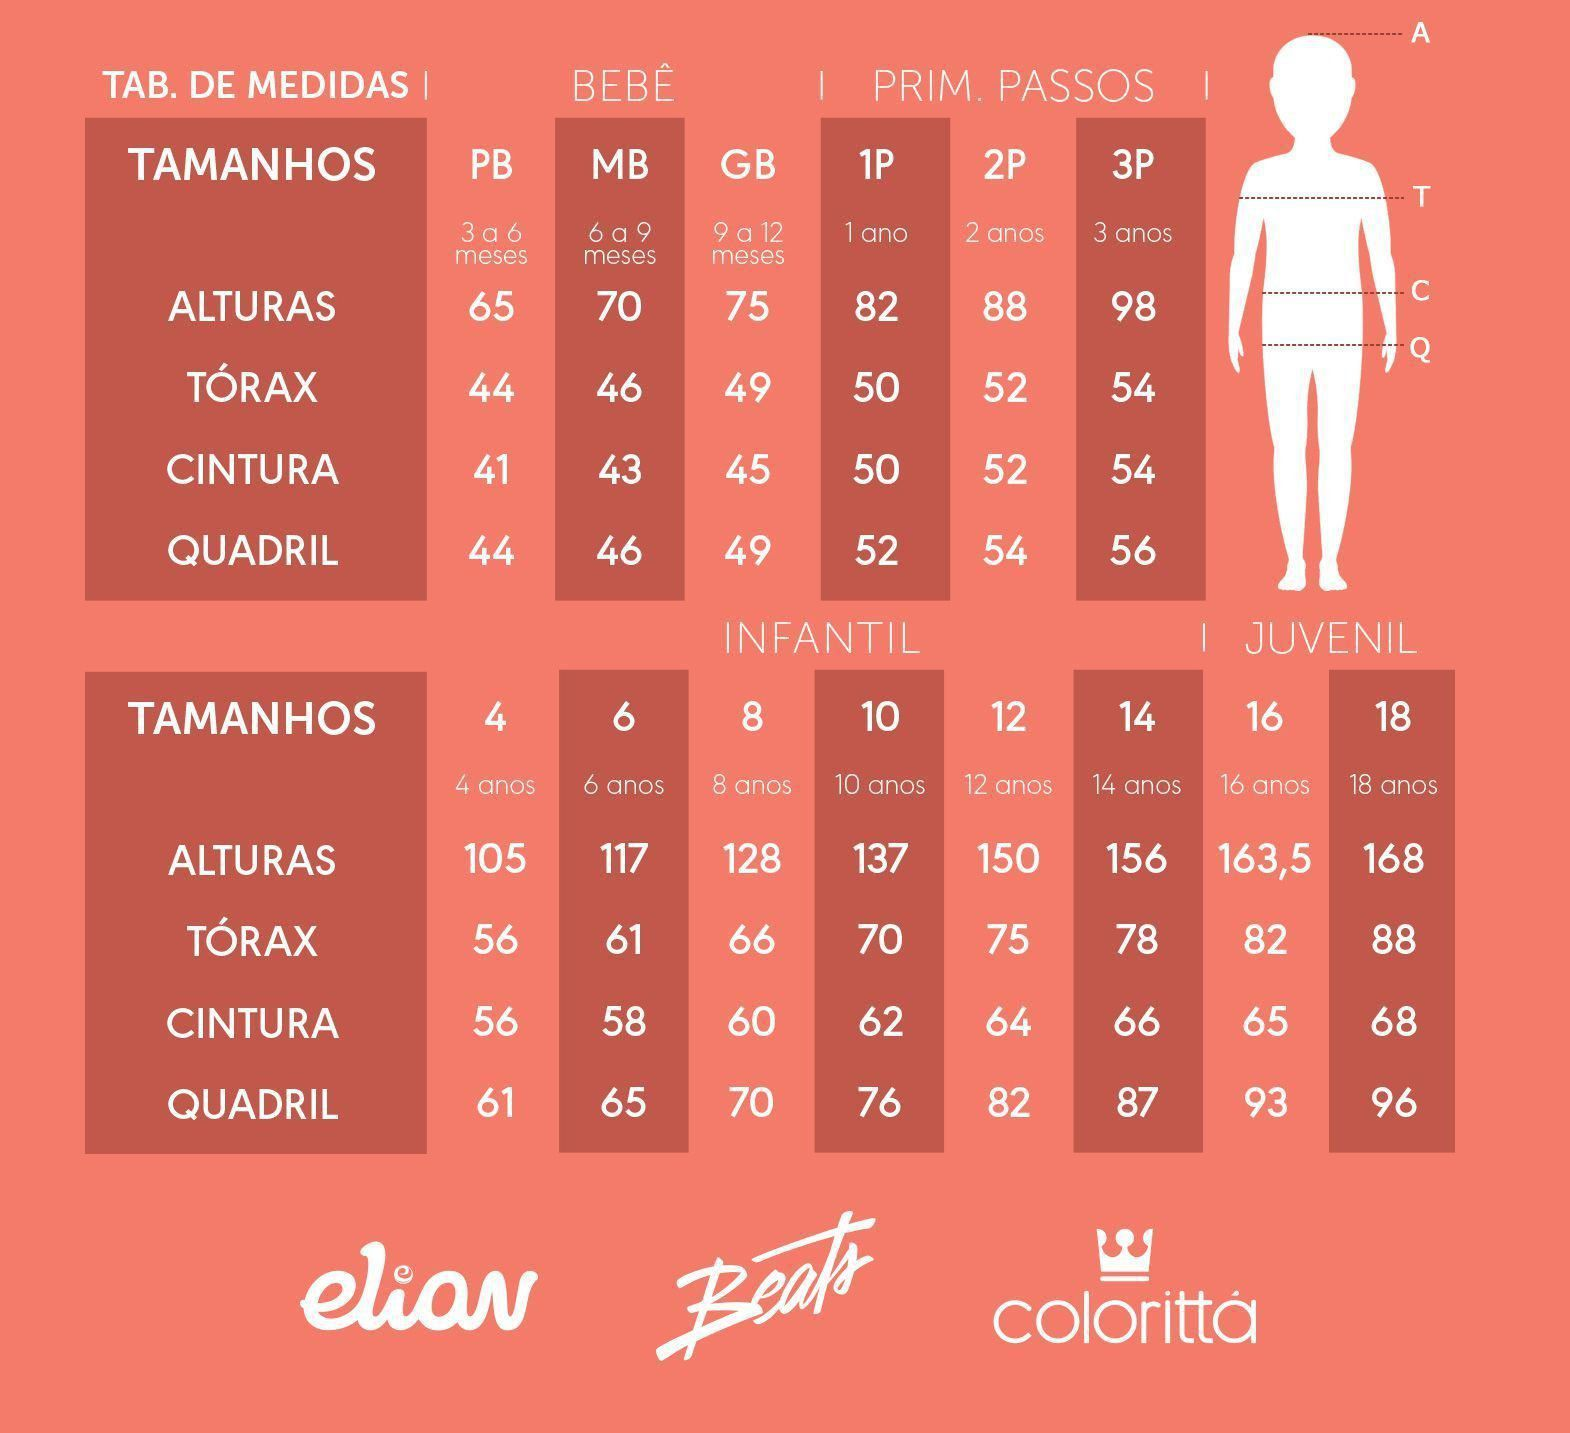 Camiseta Infantil Masculina Inverno Branca Elian: Tabela de medidas